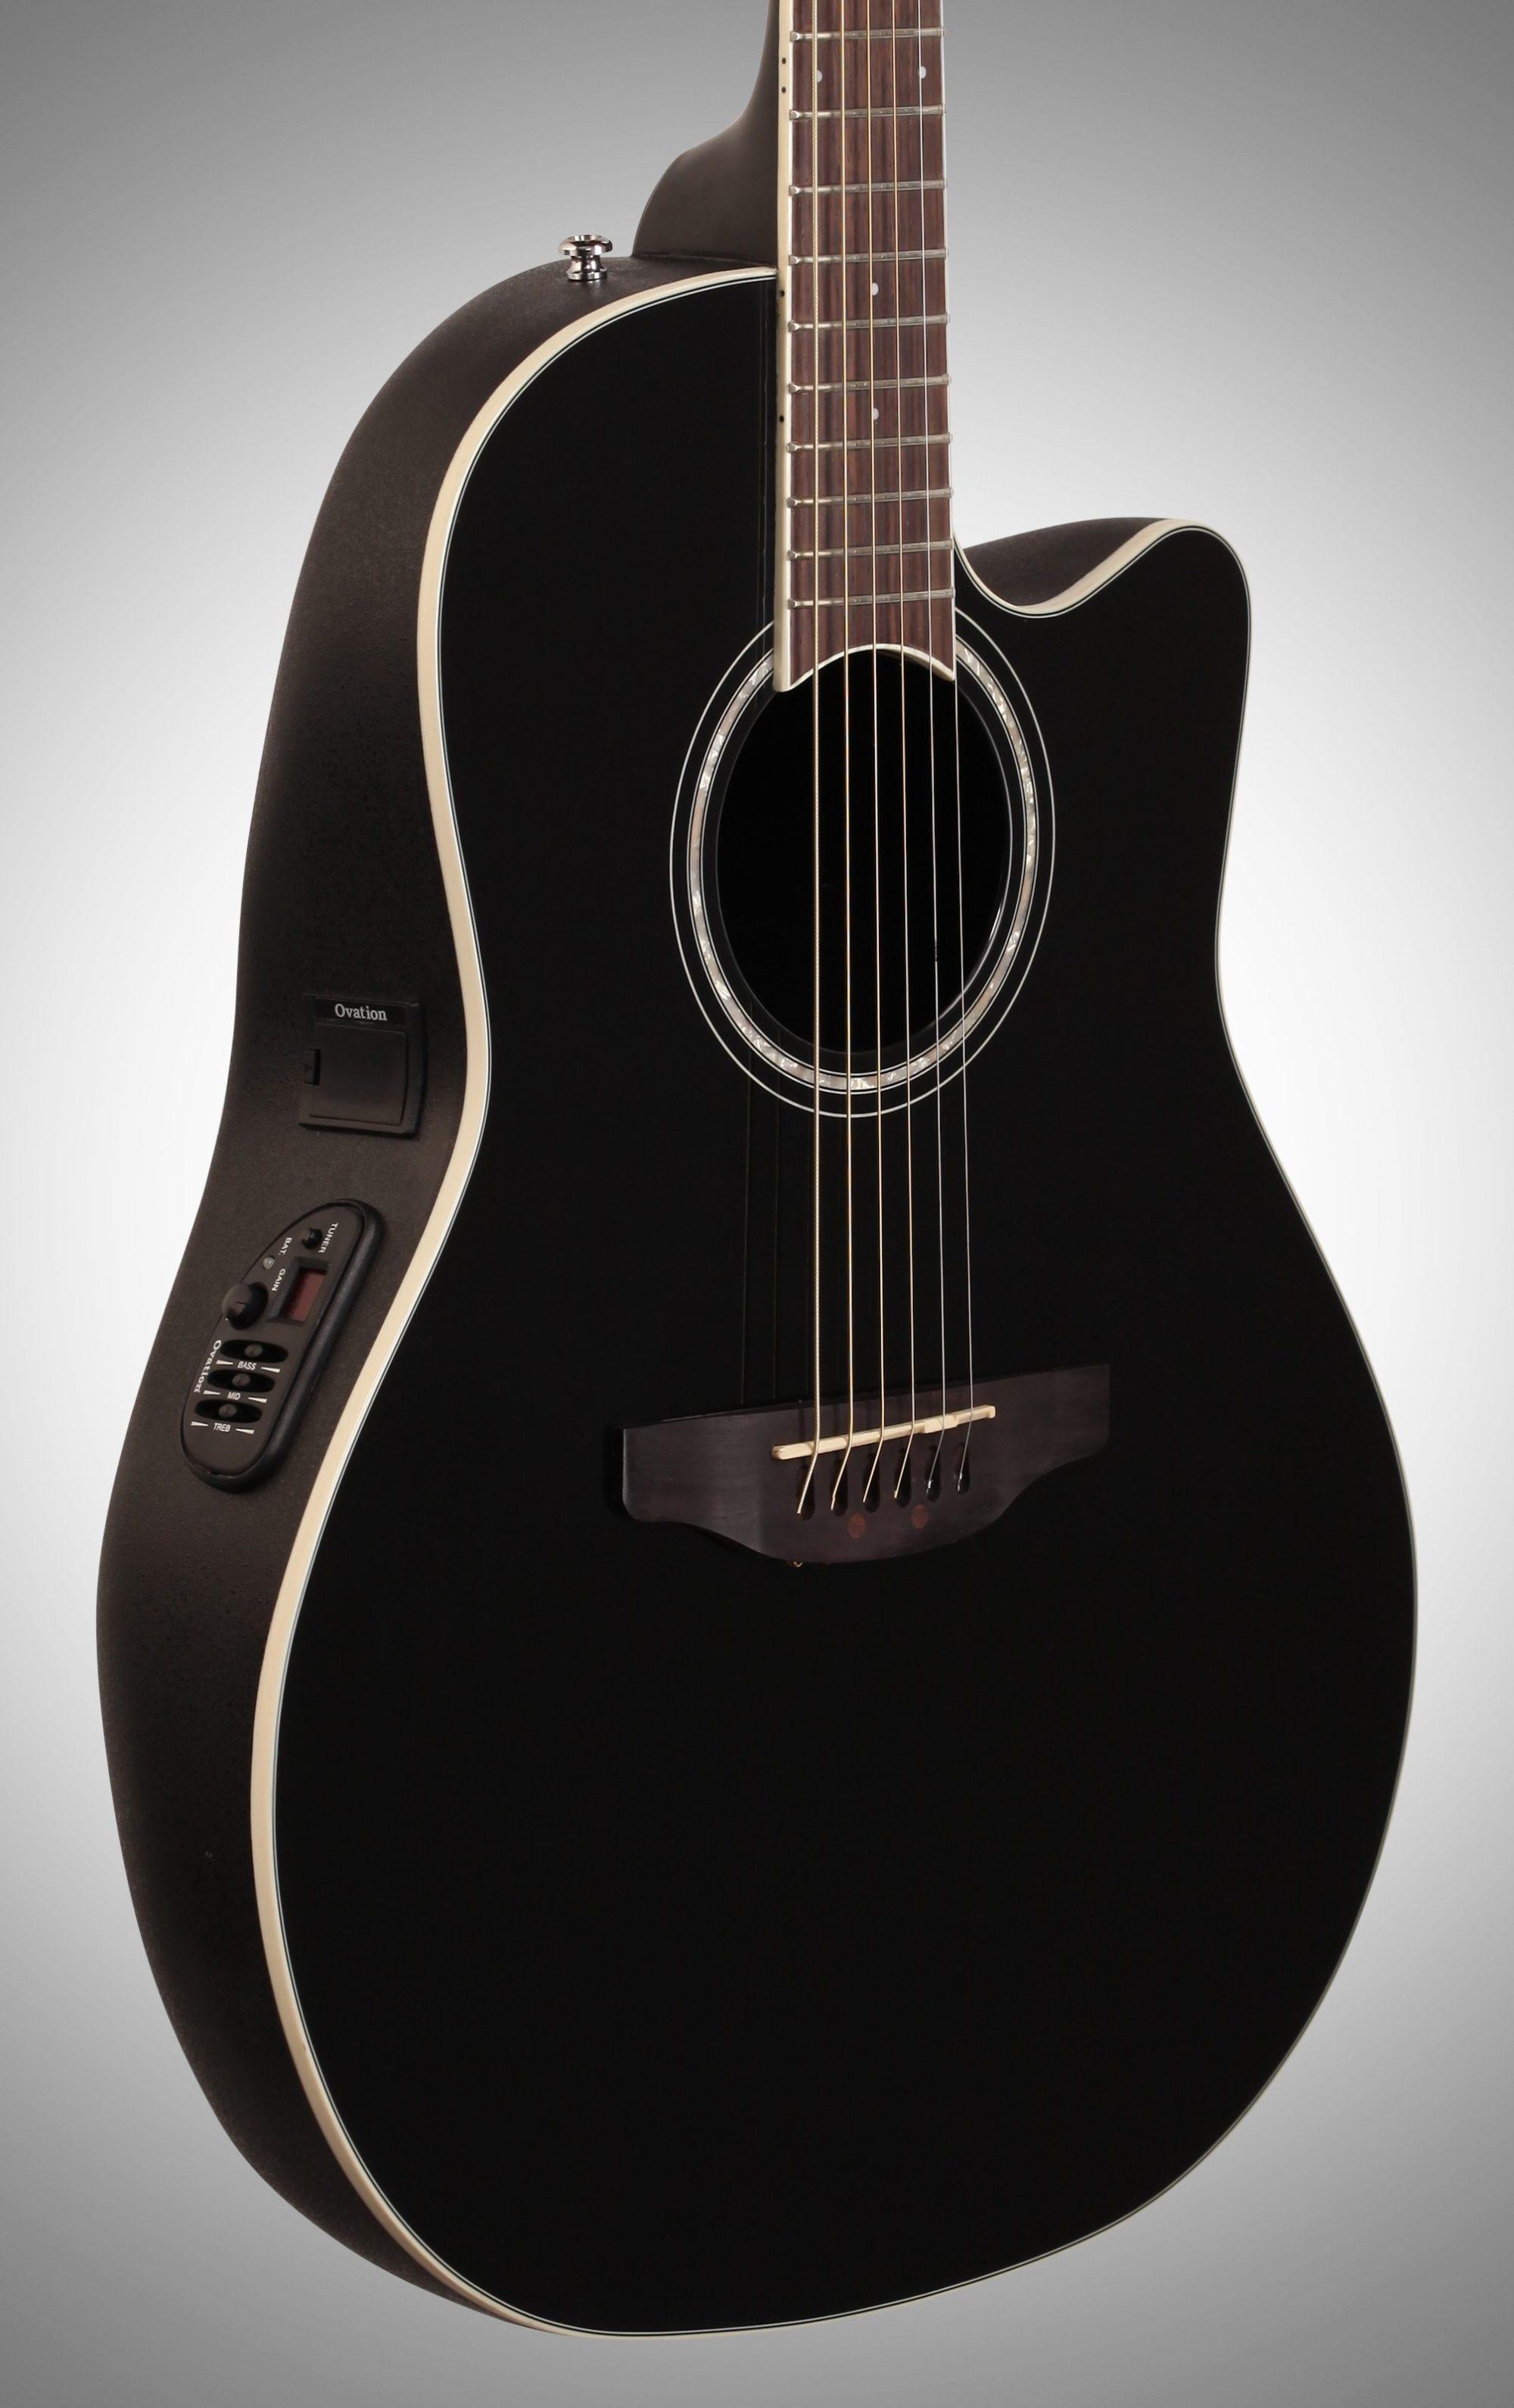 hight resolution of  ovation cs24 celebrity standard acoustic electric guitar black full left front